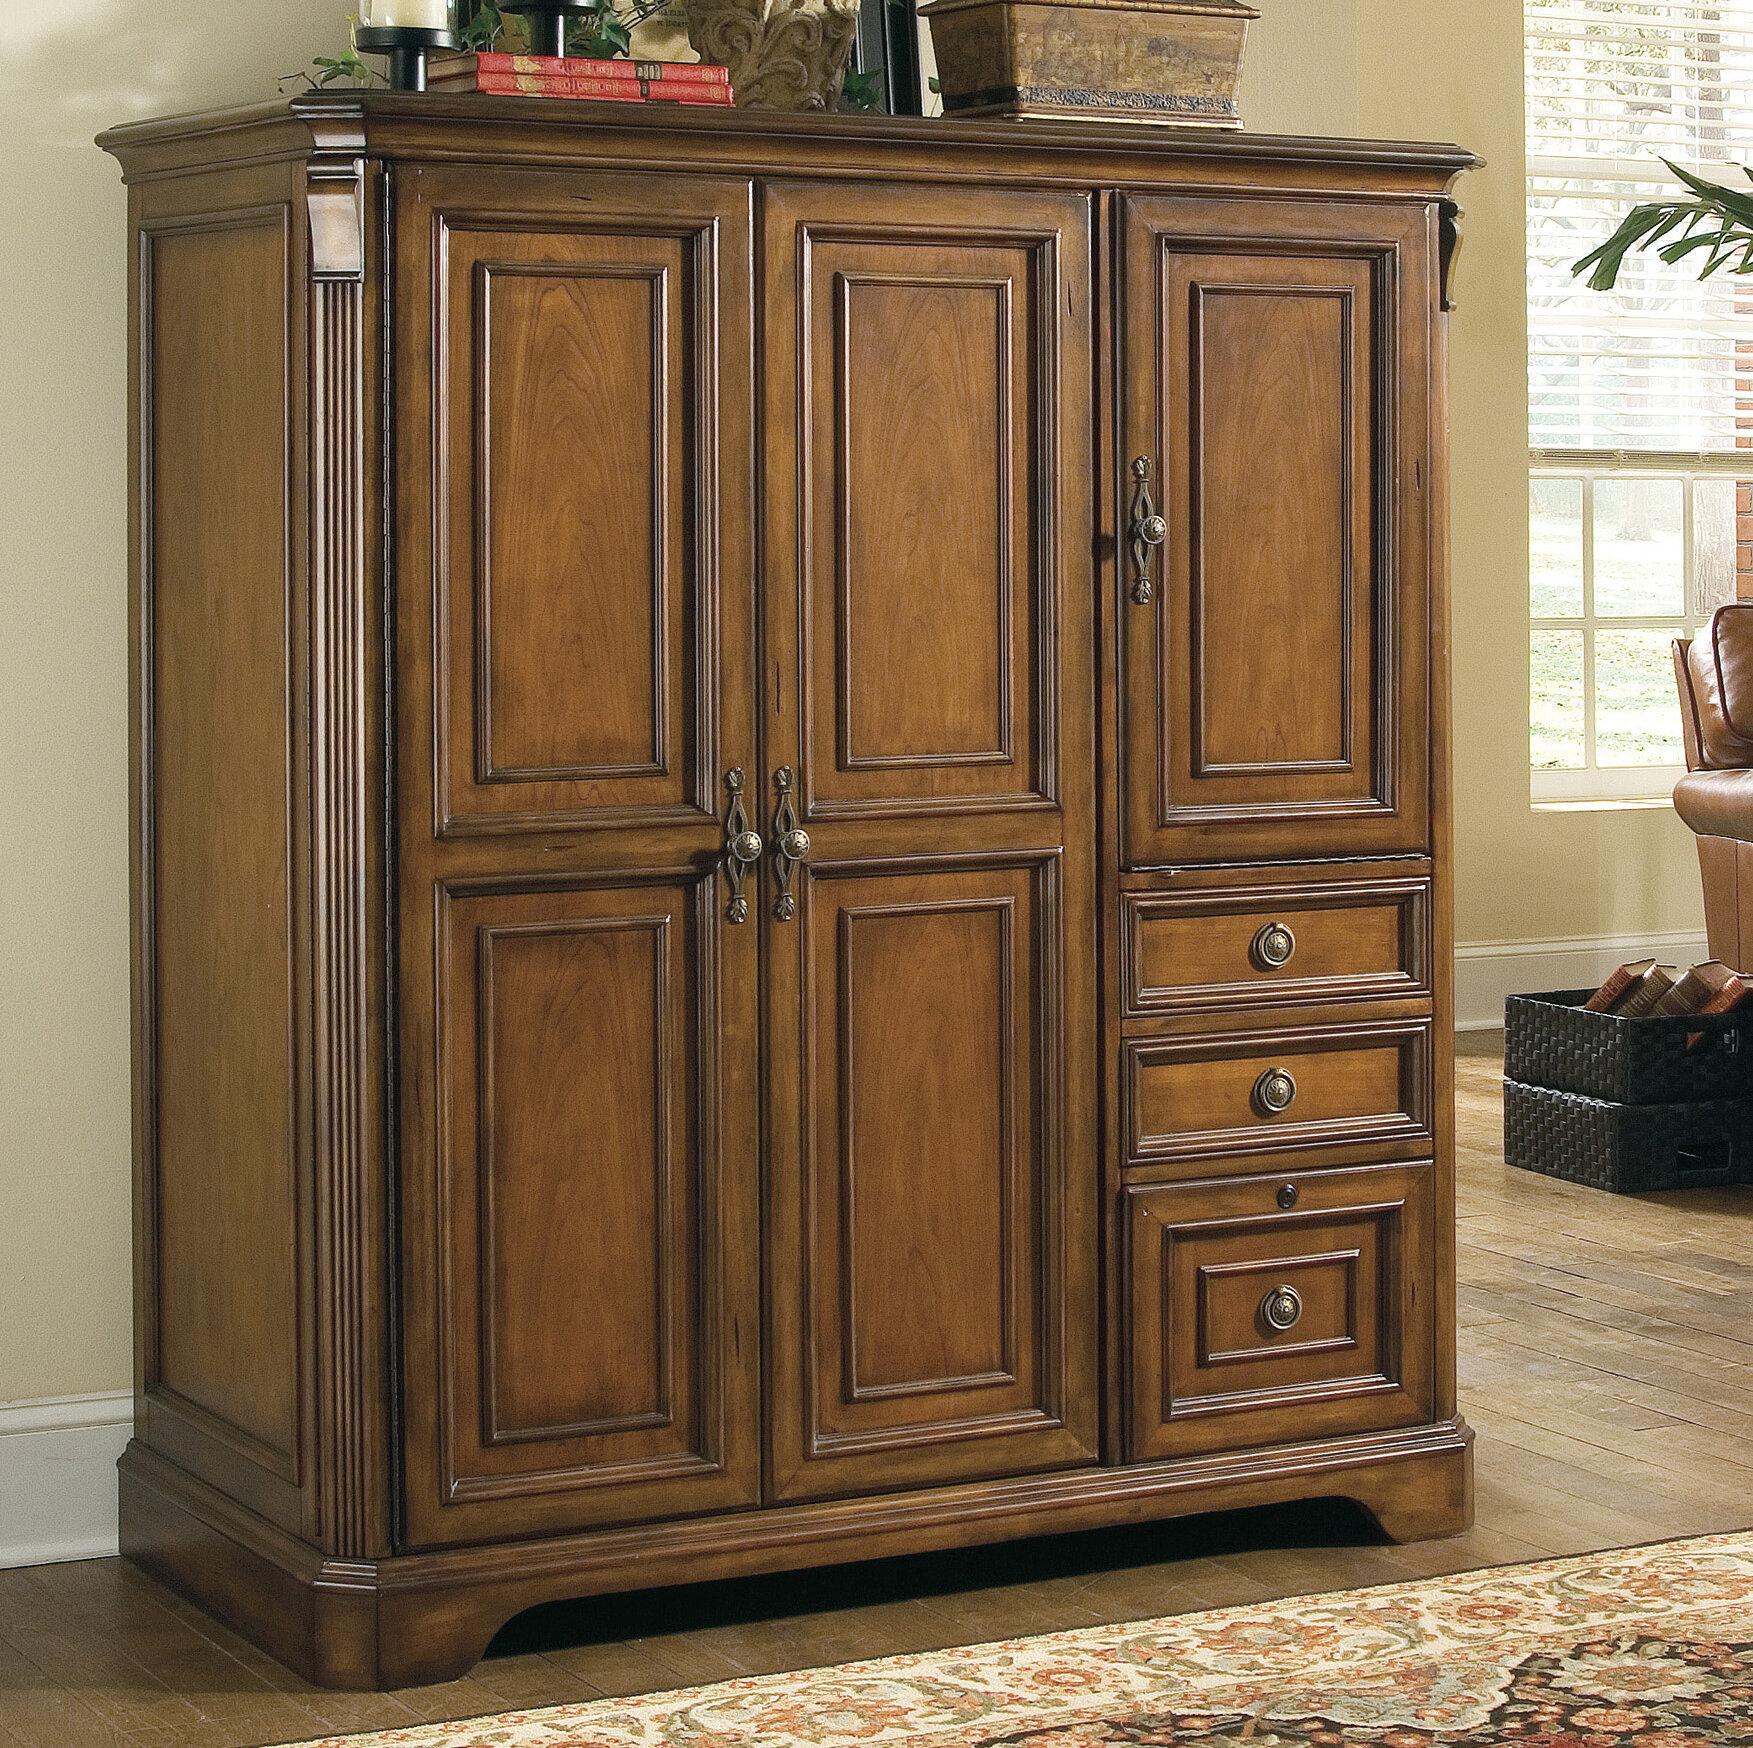 Hooker Furniture Brookhaven Armoire Desk U0026 Reviews | Wayfair